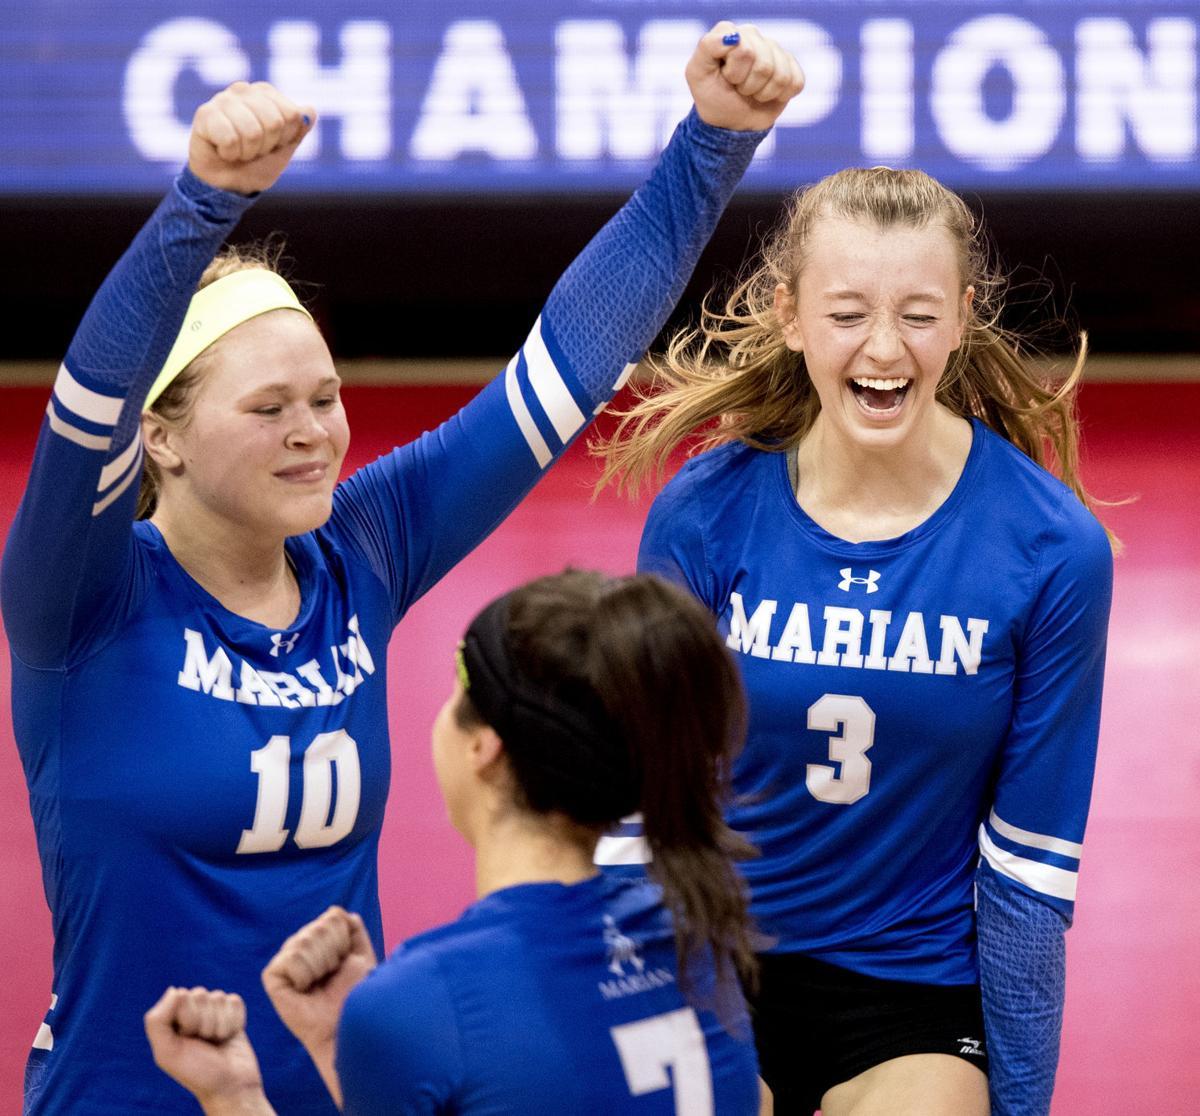 Millard North vs. Omaha Marian, A final, 11/11/17